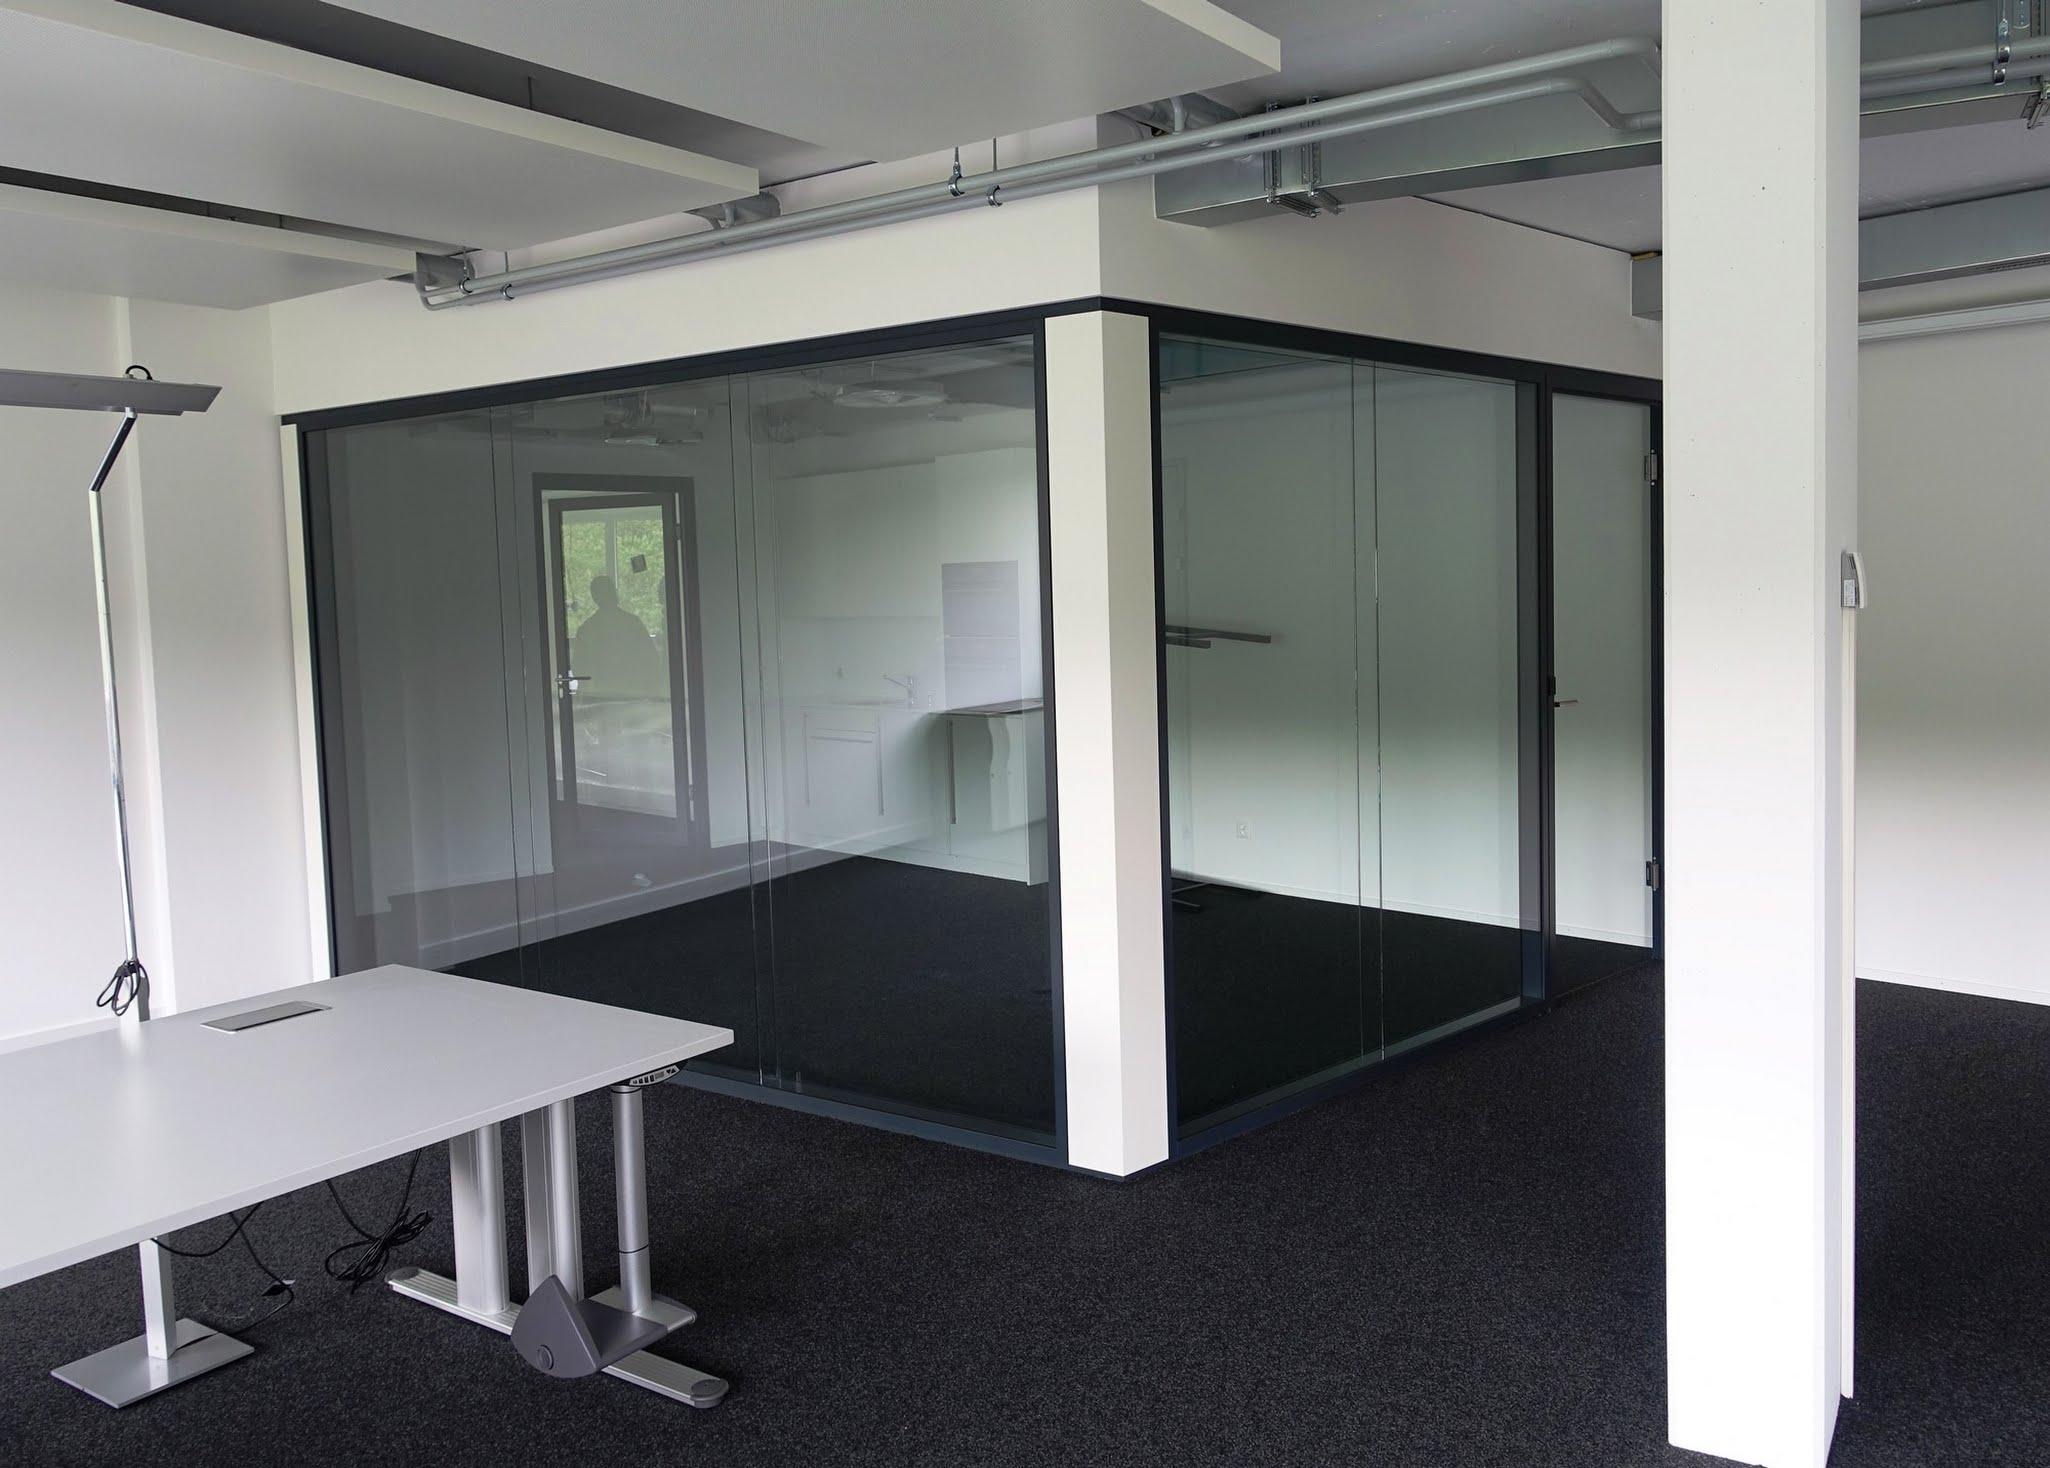 NovaFlex - Bürotrennwand,NovaPlain - Doppelverglasung,CKW ,Deckensystem-Wandsysteme,Trennwände Büro,Ganzglaswände,Bürotrennwand,Akustikdecken,Schallschutzdecken,Trennwände,Glaswände,Faltwände,Raumgestaltung,Trennwand Systeme